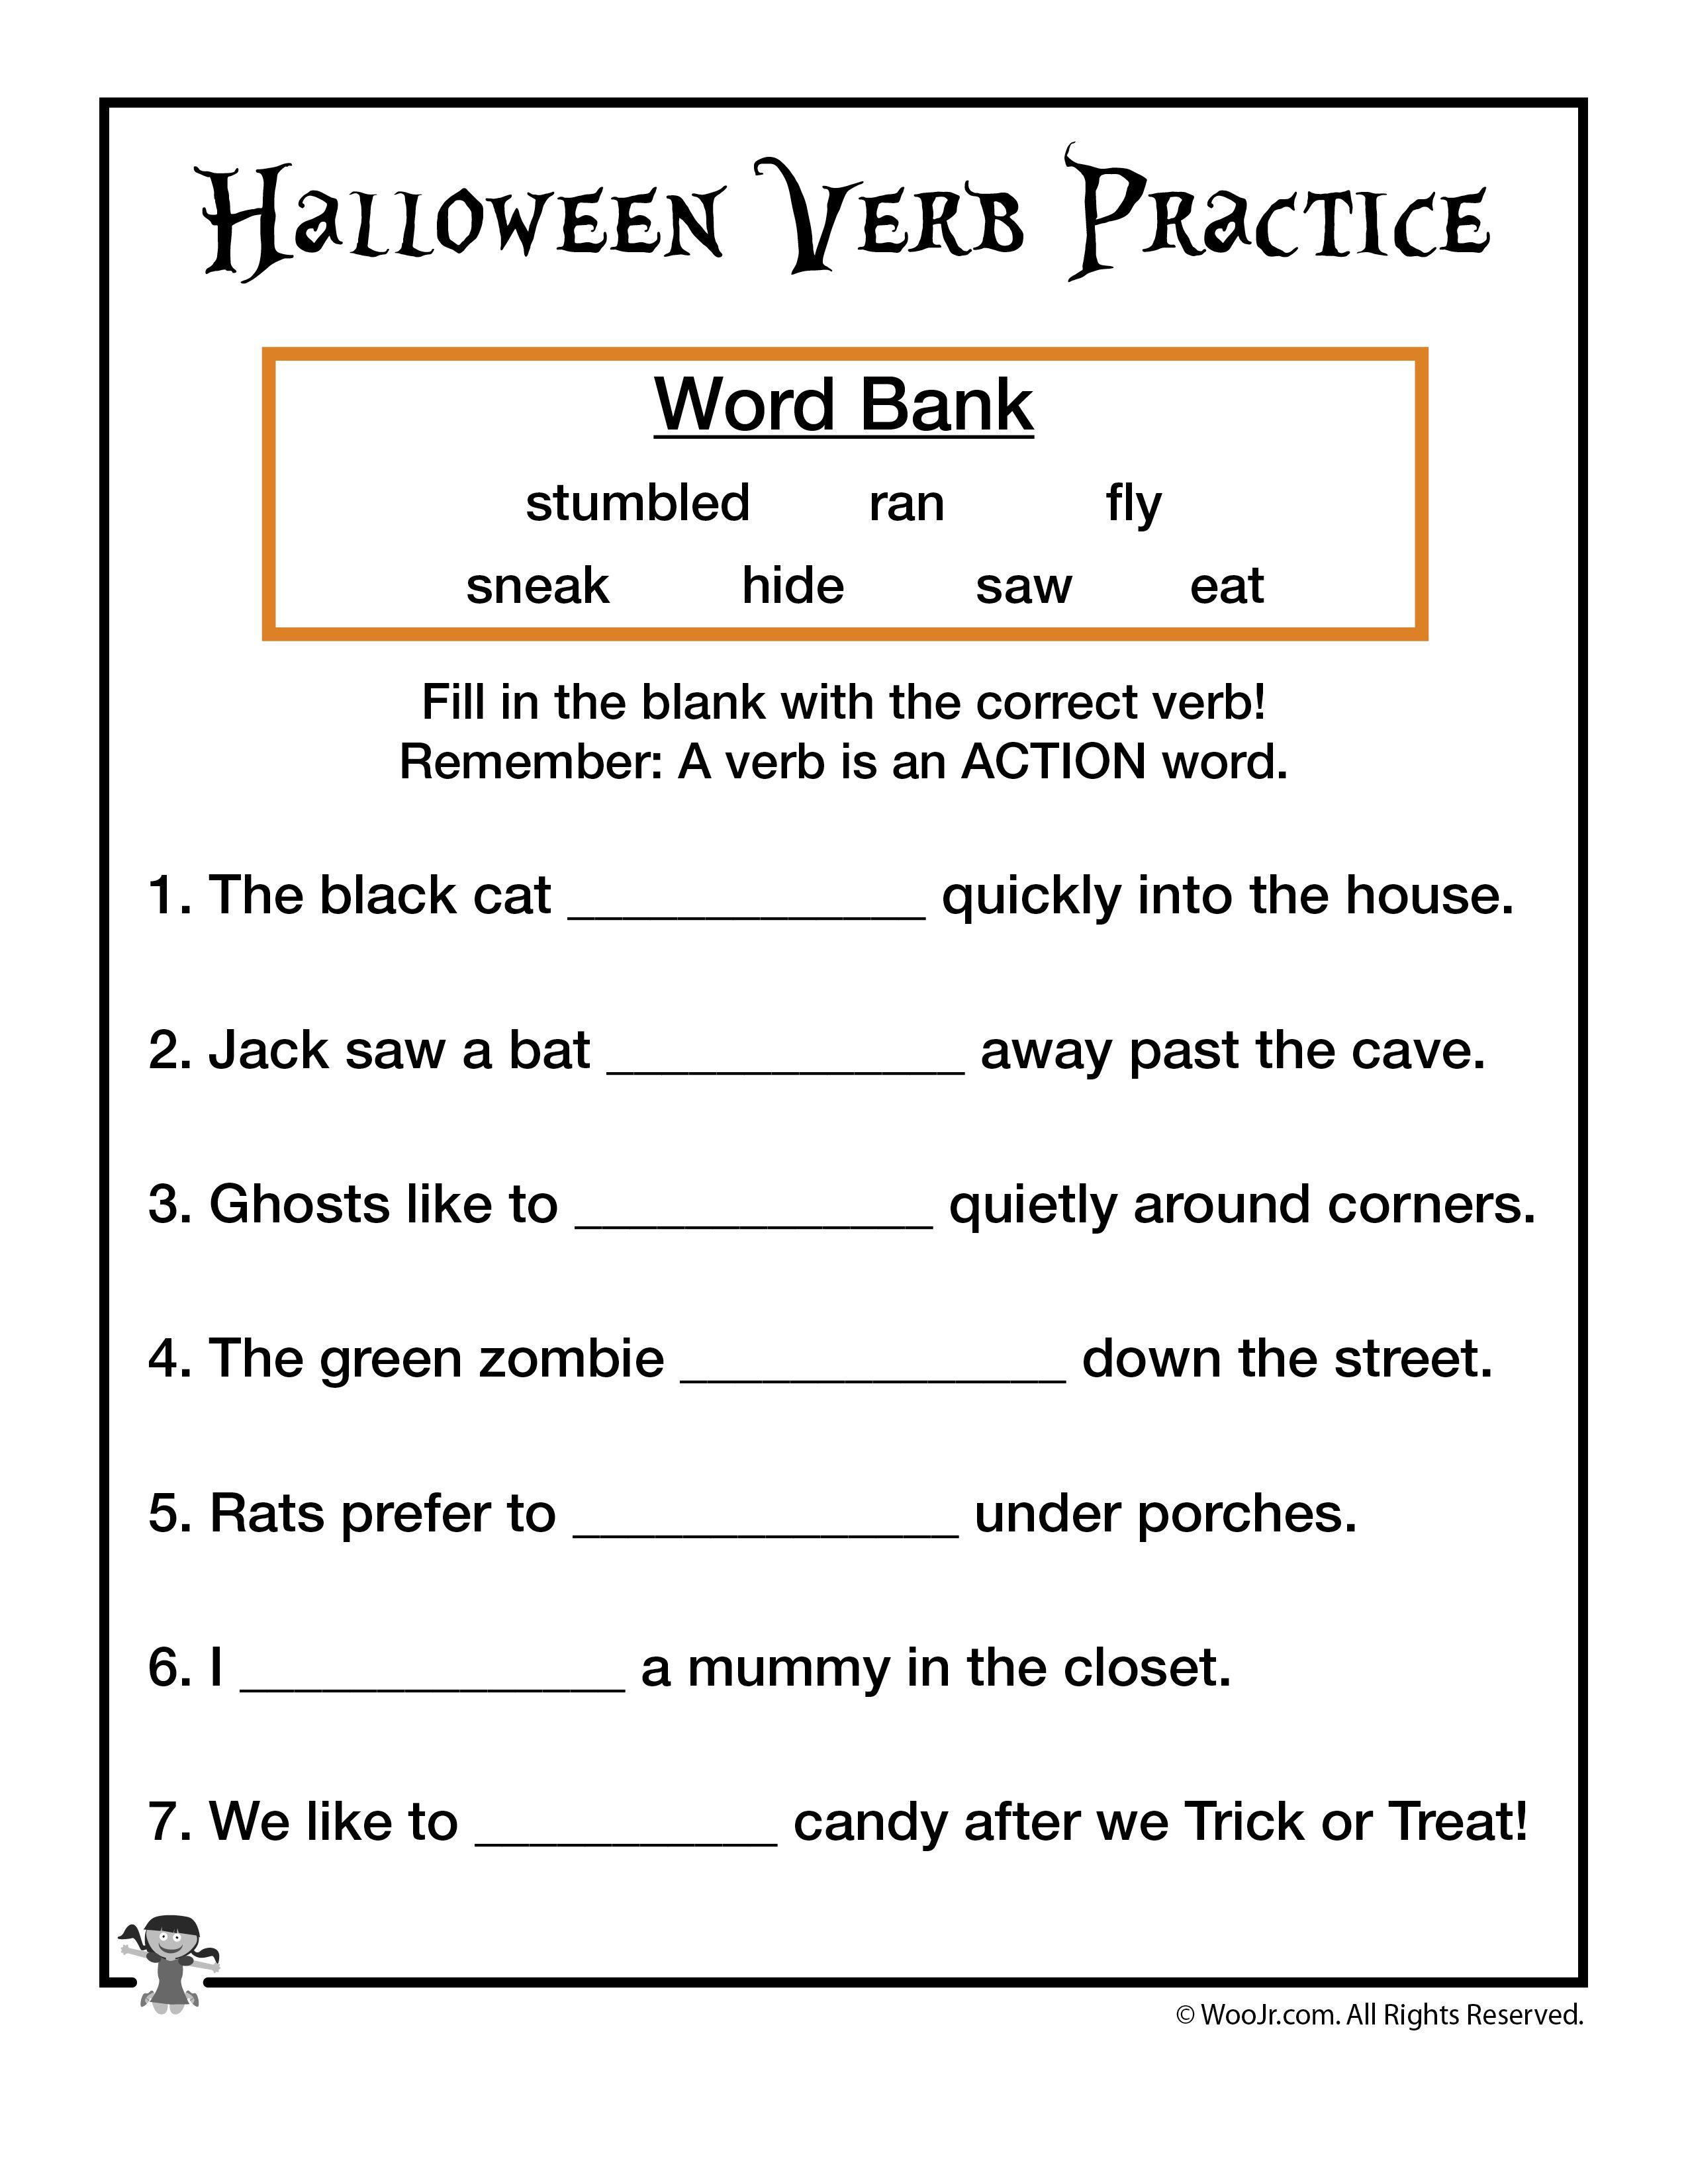 Halloween Verb Practice Worksheet